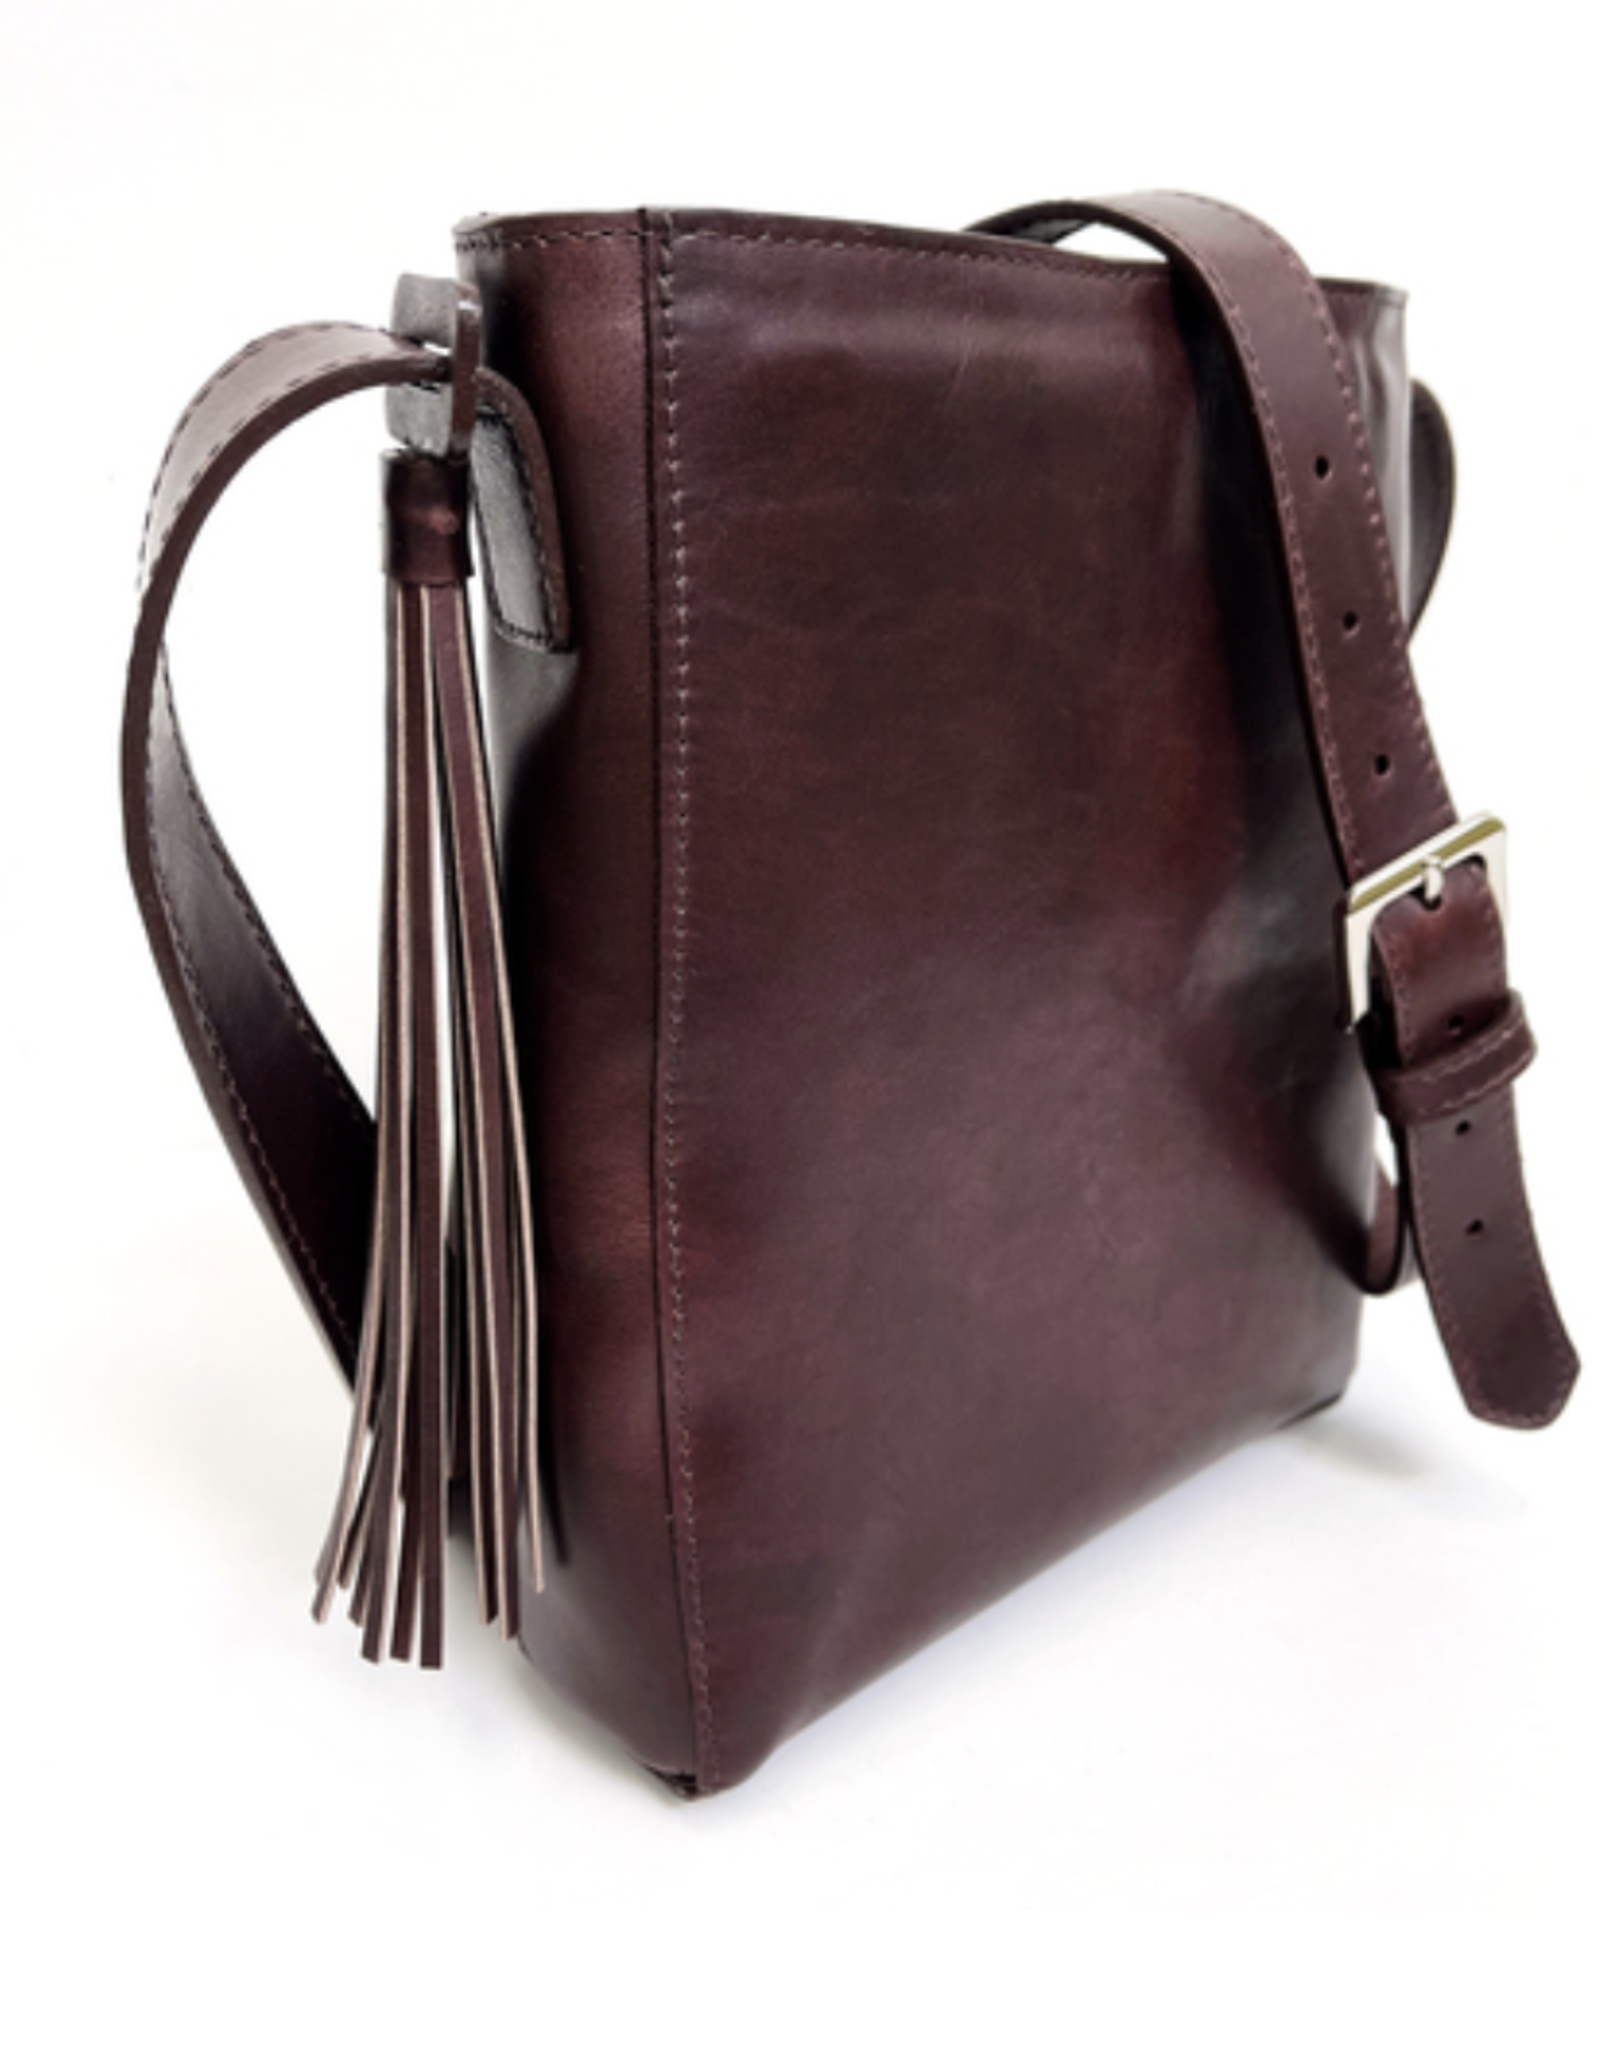 Brave VIKTORIA Bag